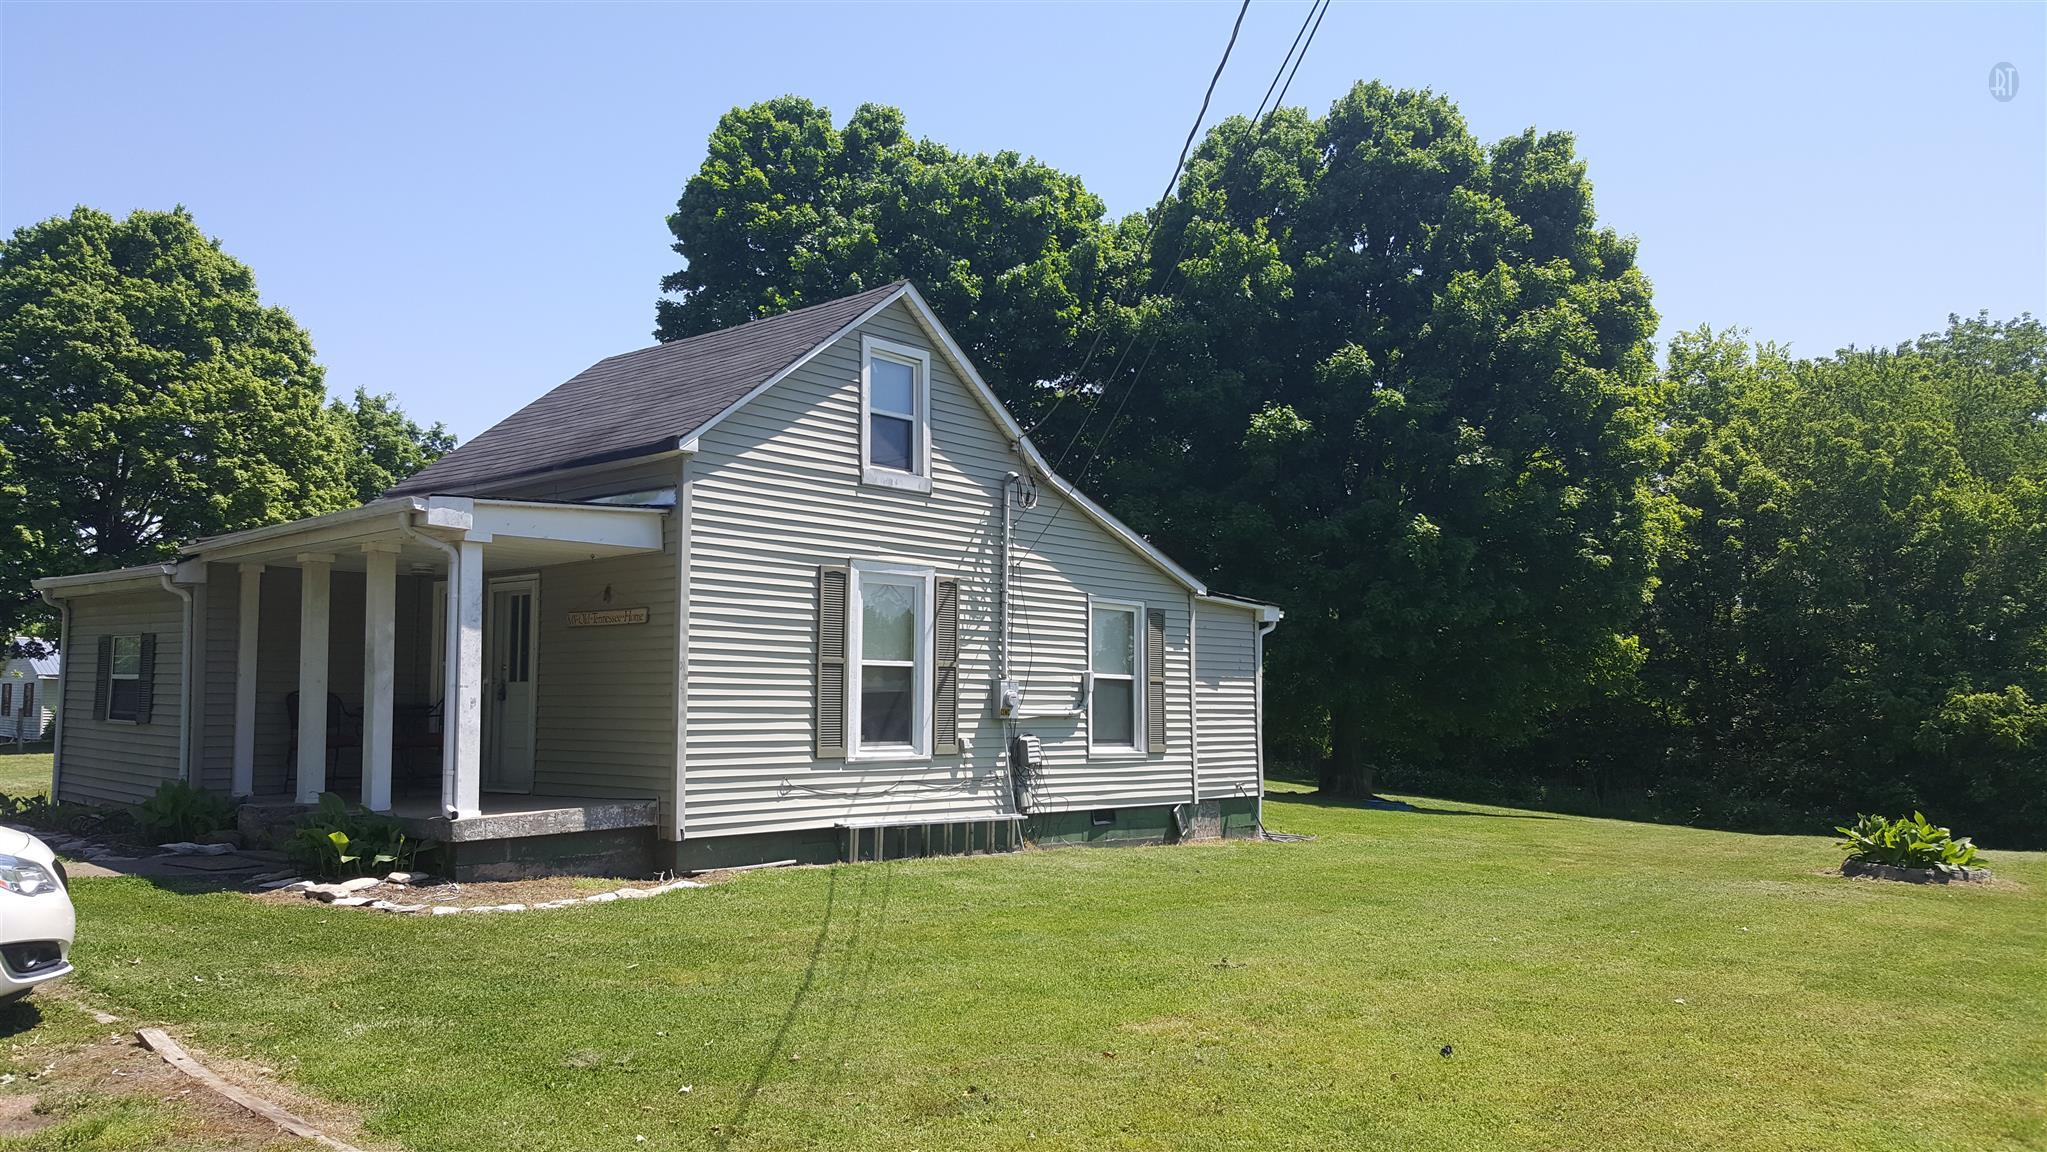 306 N Commerce St, Adams, TN 37010